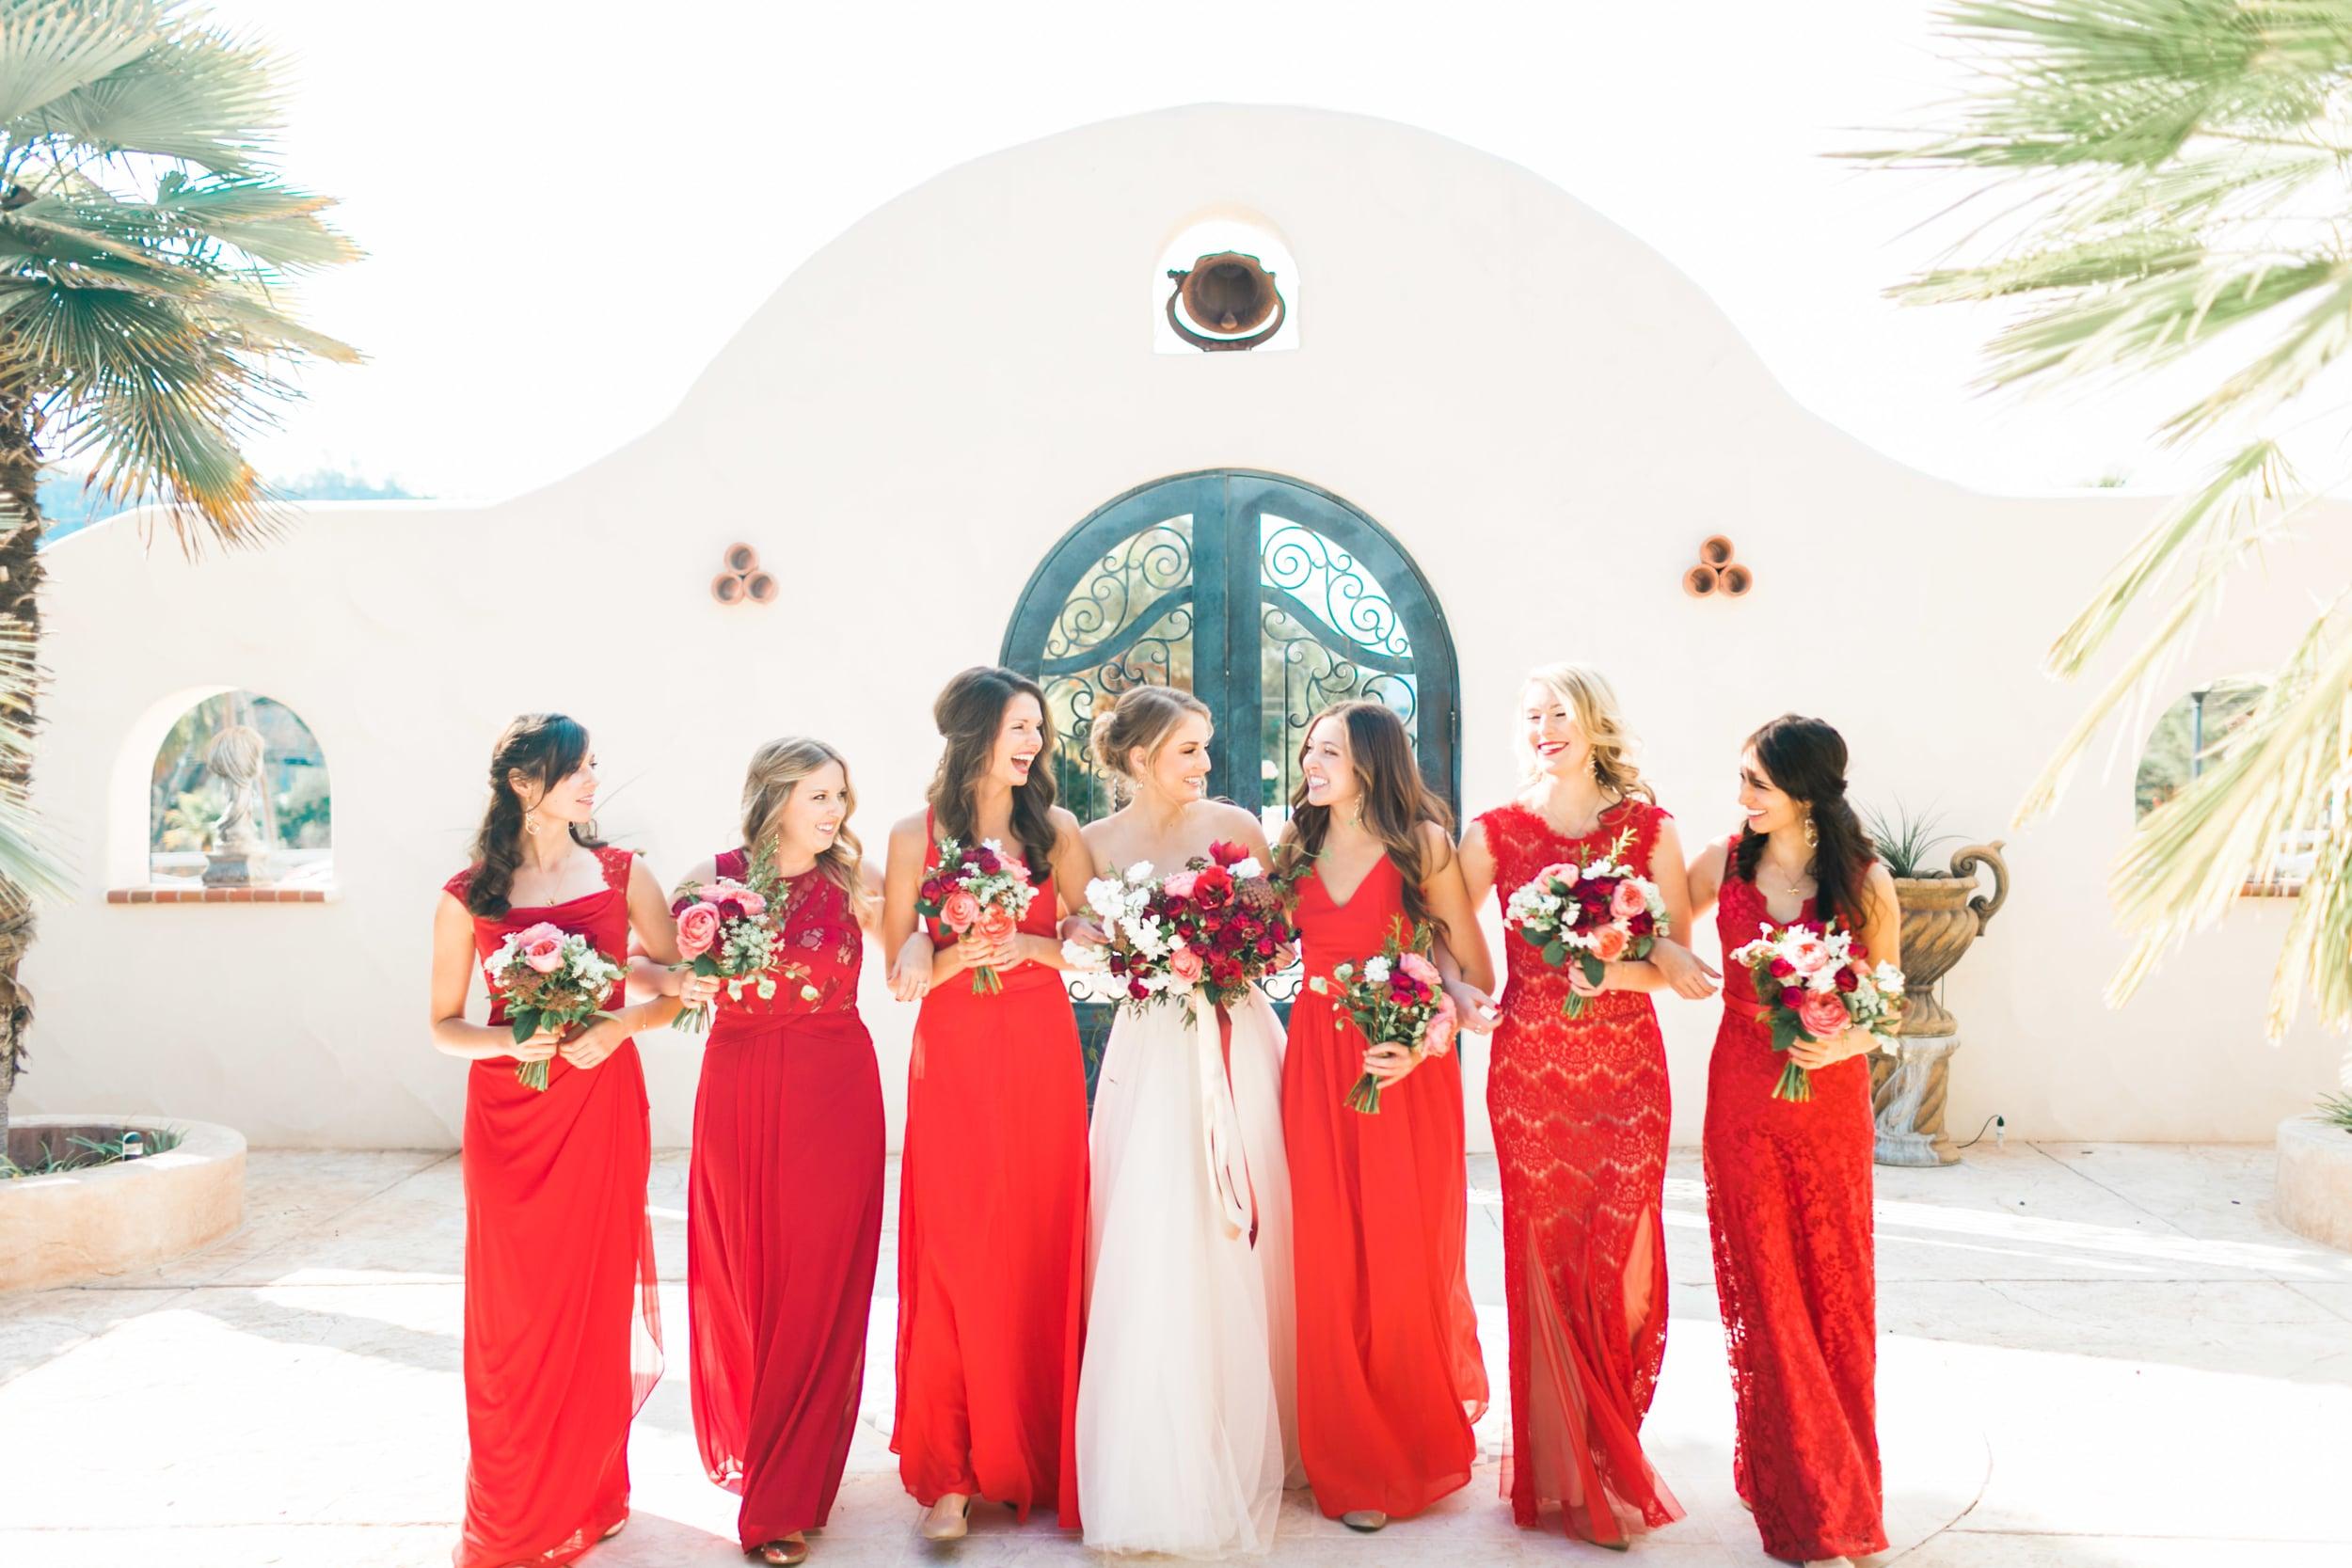 Natalie_Schutt_Photography_Winter_Wedding_San_Luis_Obispo-60.jpg